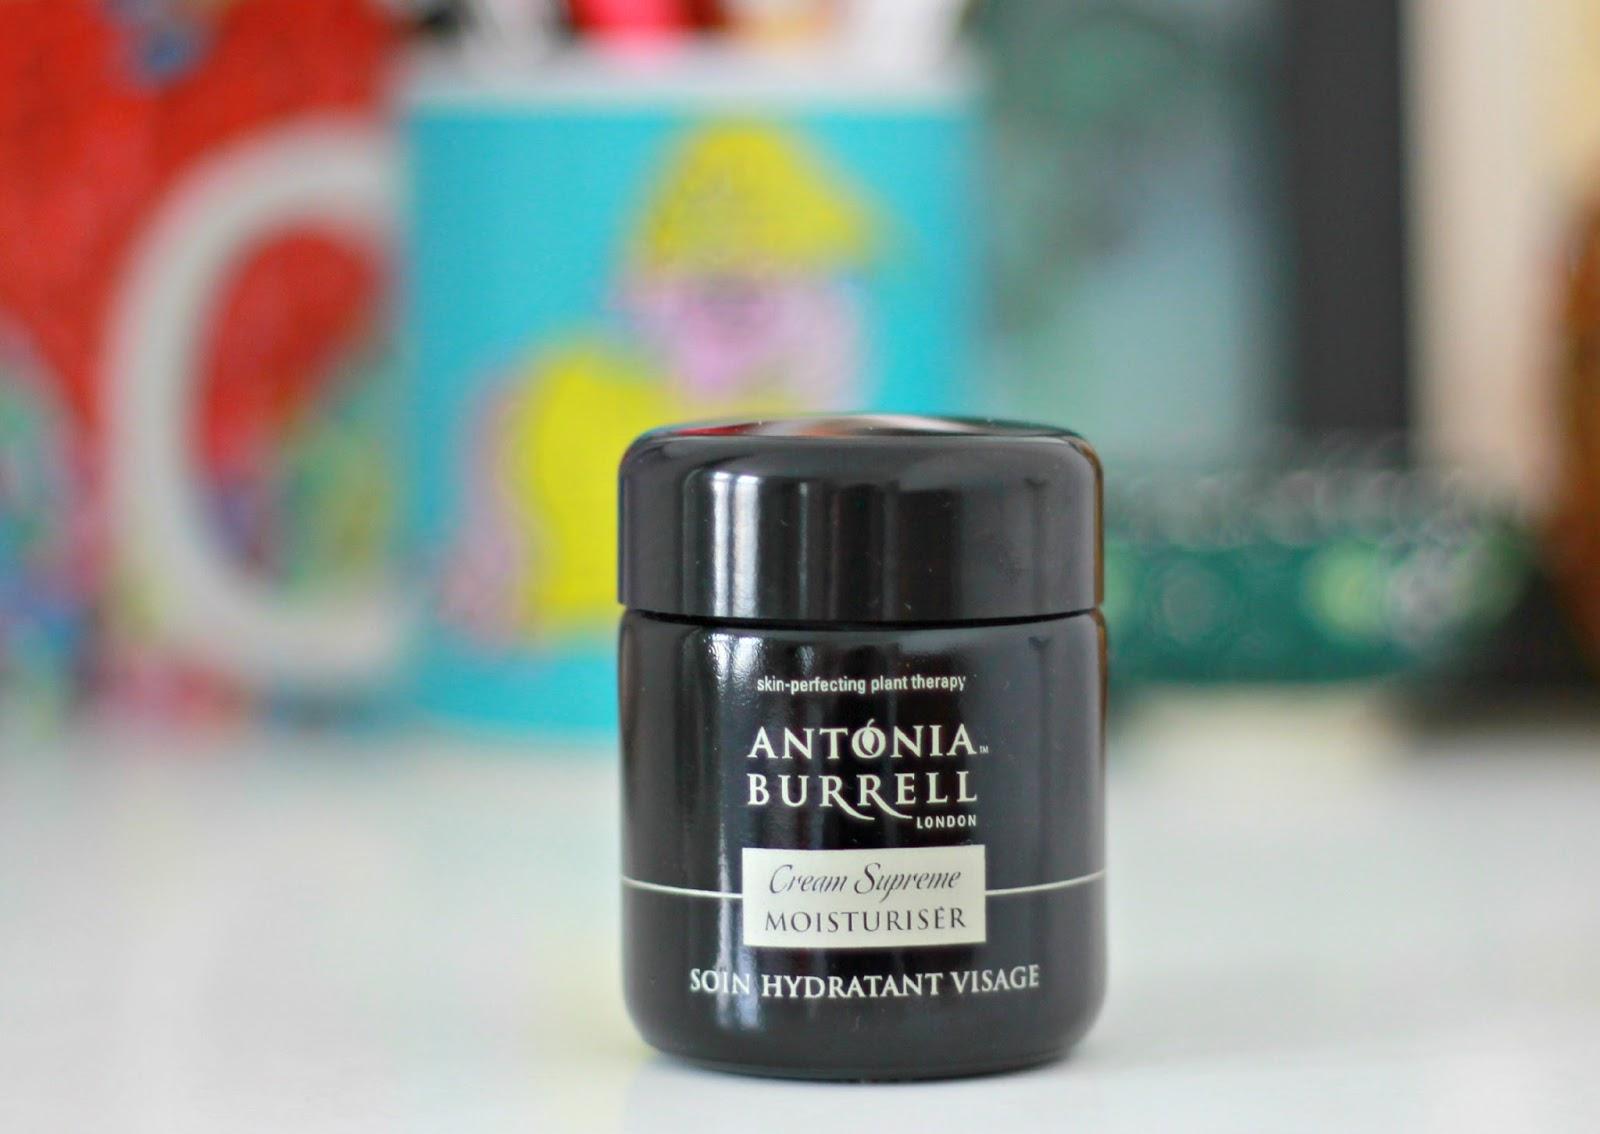 Antonia Burrell Creme Supreme moisturiser review